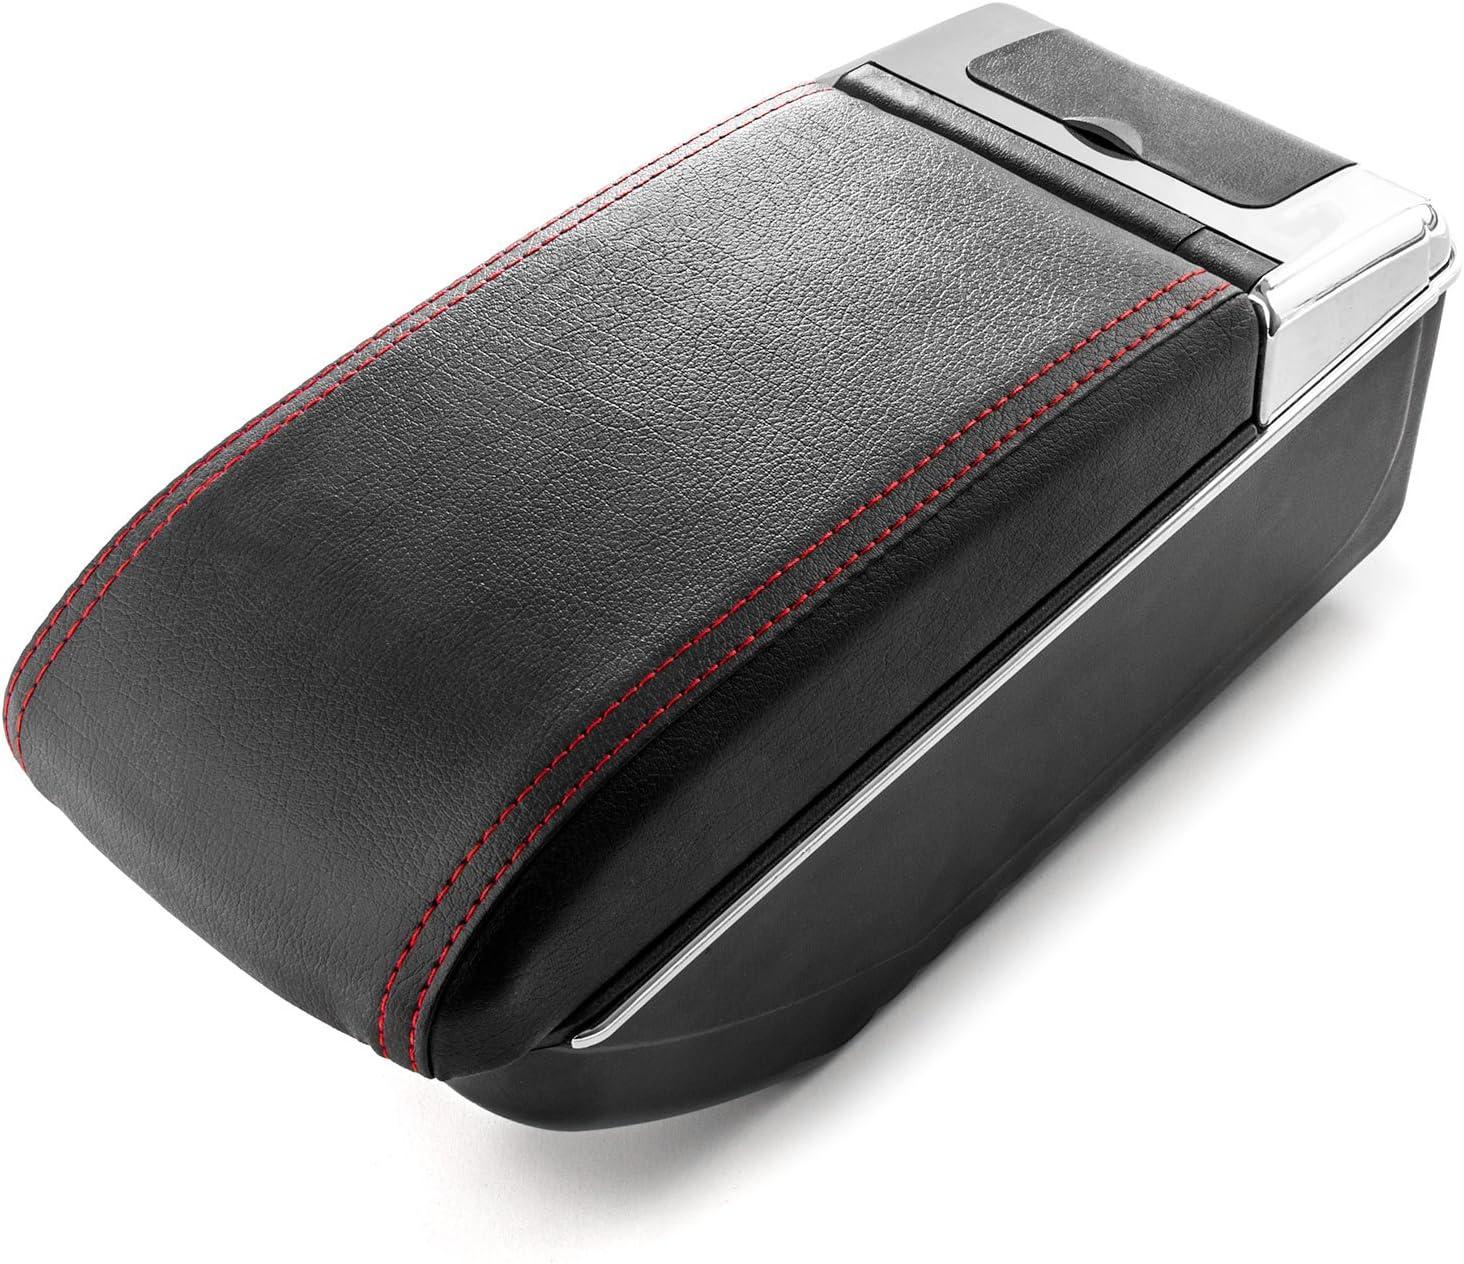 Car Armrest Purchase Center Console Box Black Handrest Storage Compatible Manufacturer regenerated product